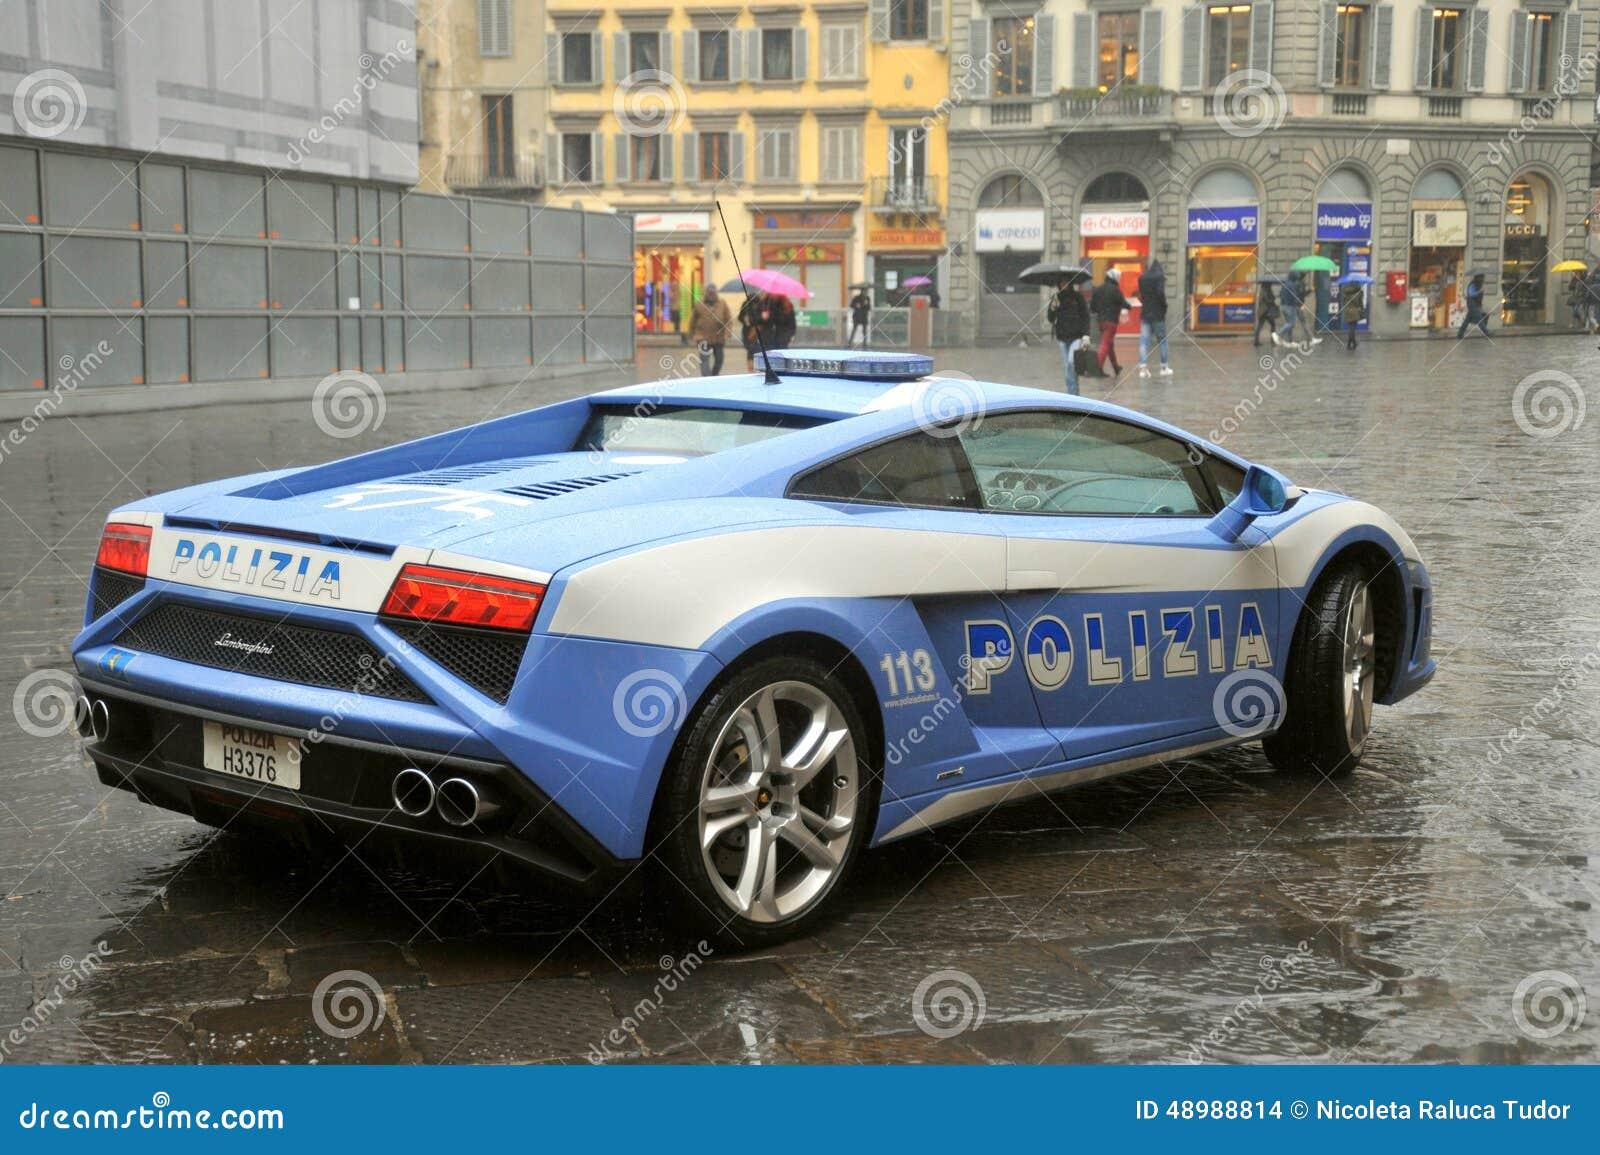 voiture de police de luxe de lamborghini florence italie image stock ditorial image 48988814. Black Bedroom Furniture Sets. Home Design Ideas